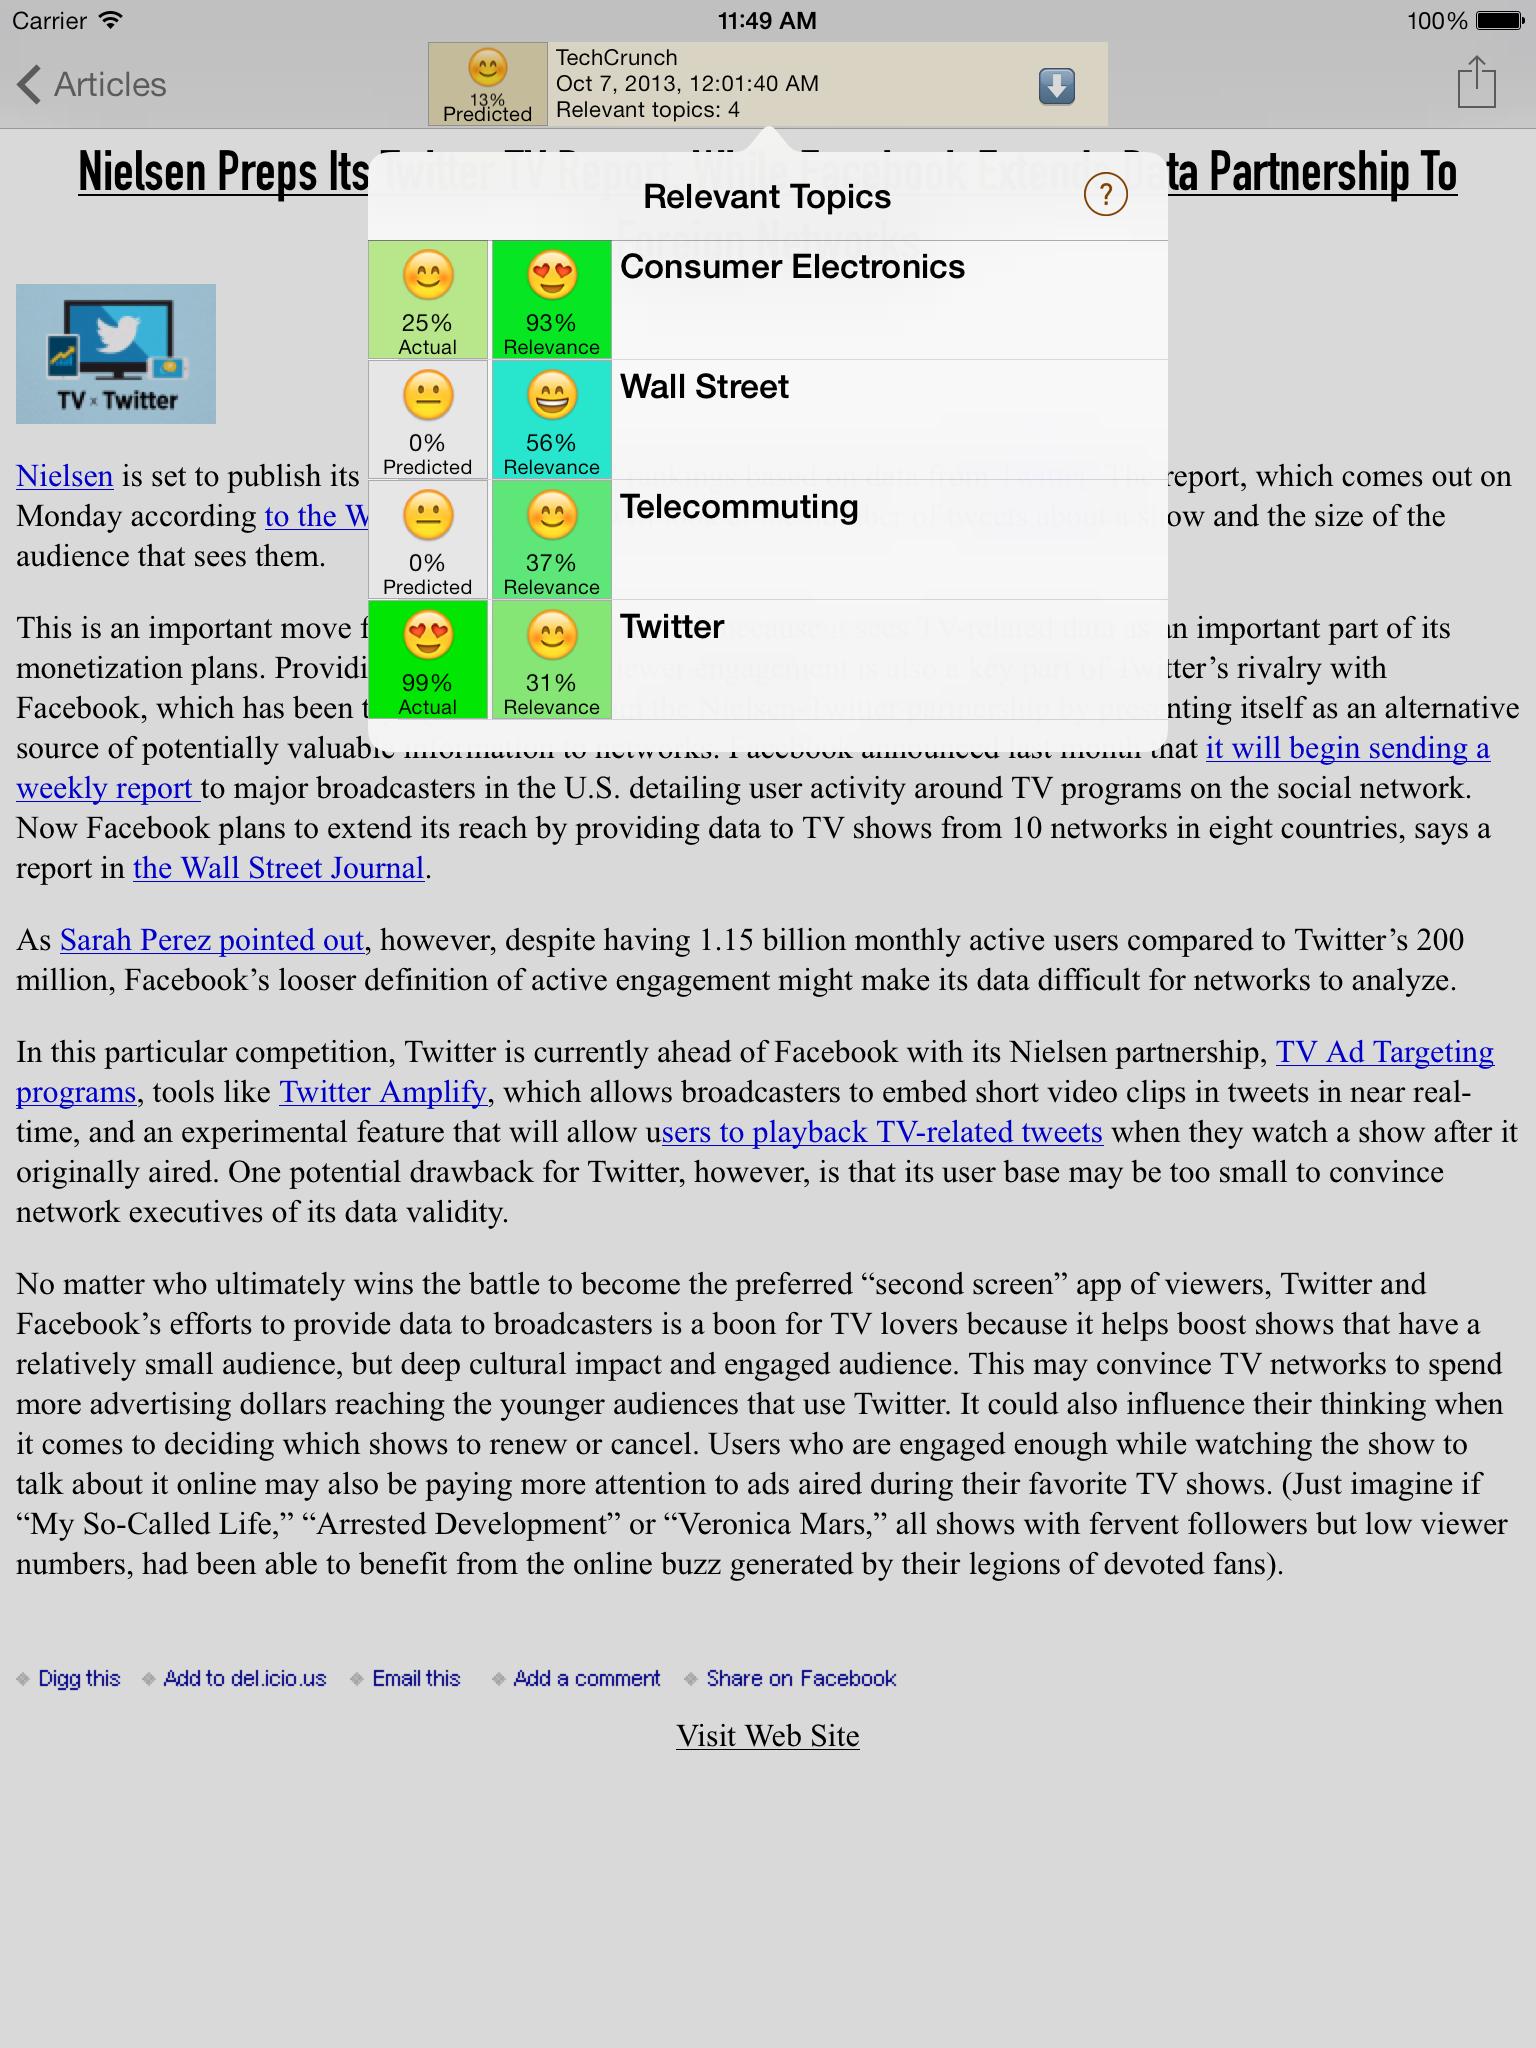 iOS Simulator Screen shot Nov 7, 2013, 11.49.58 AM.png